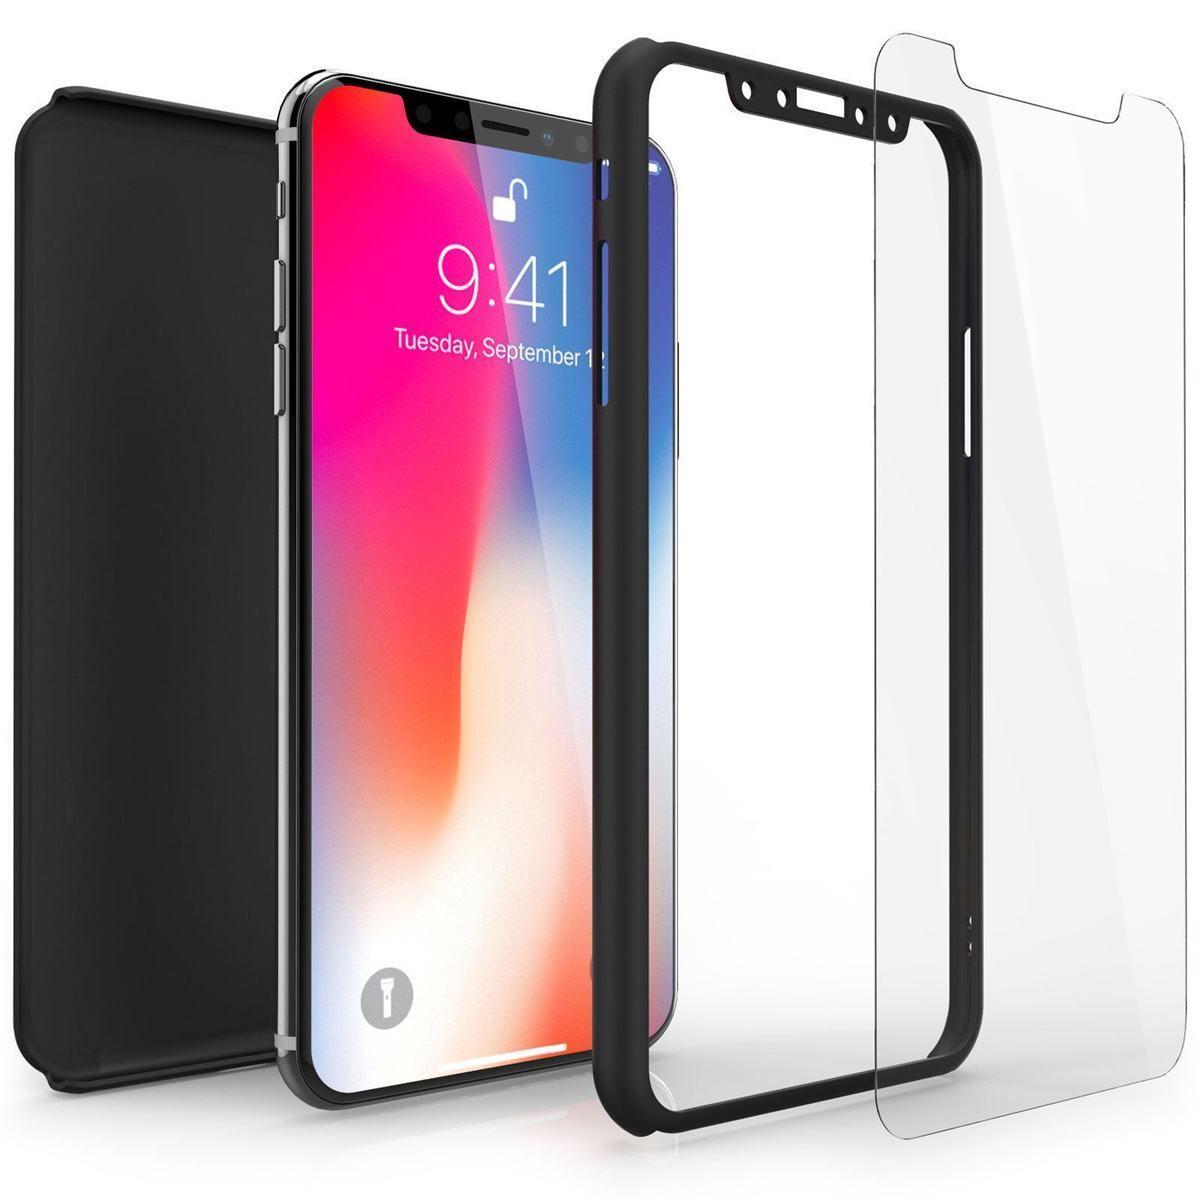 For-Apple-iPhone-XS-Max-XR-Hybrid-360-Slim-Ultra-Thin-Heavy-Duty-Shockproof-Case Indexbild 53